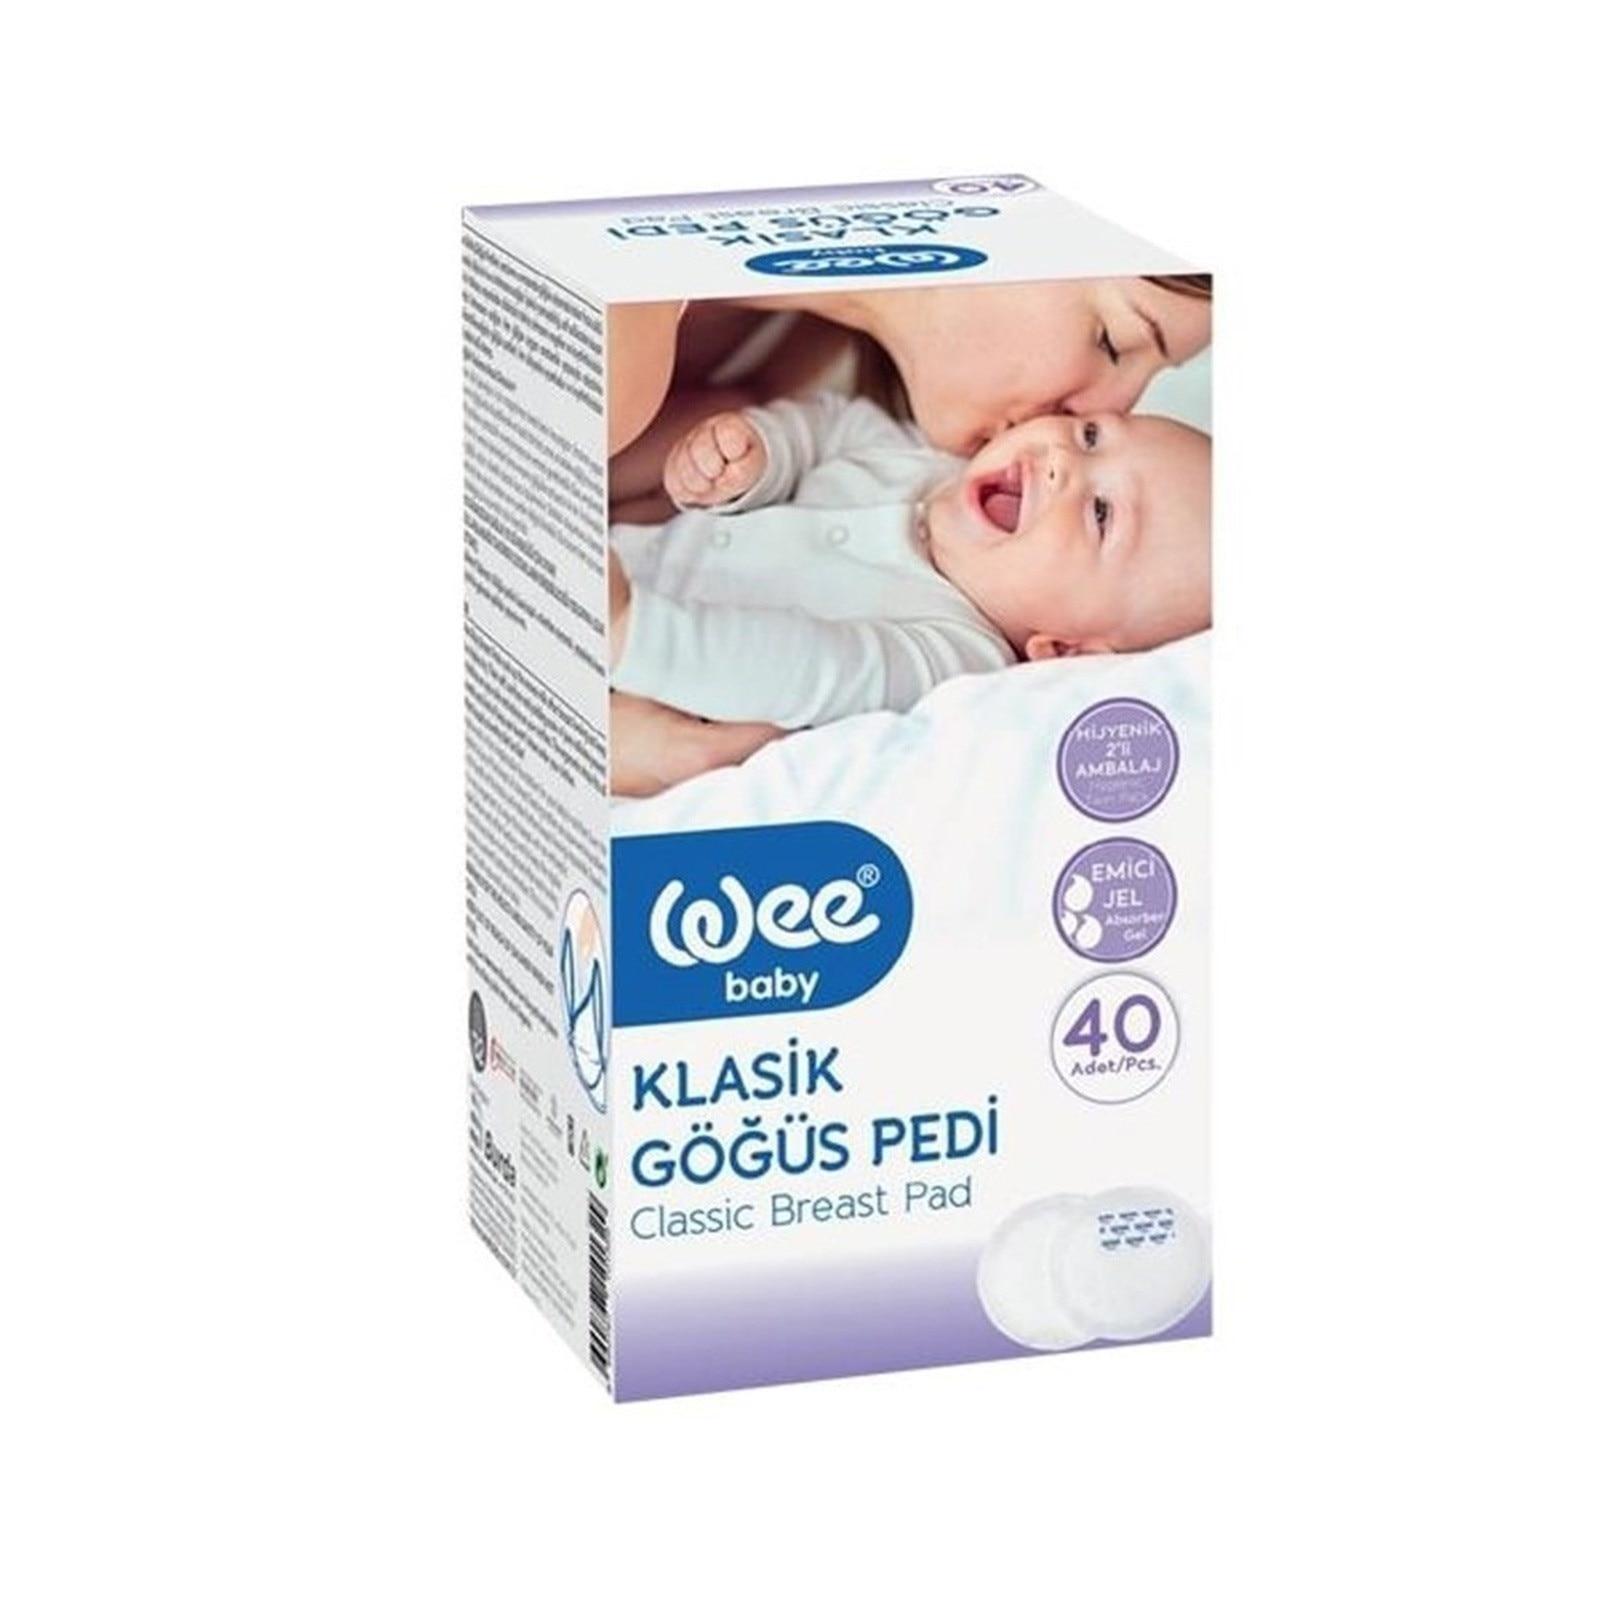 Ebebek Wee Baby Classic Breast Pad 40 Pcs